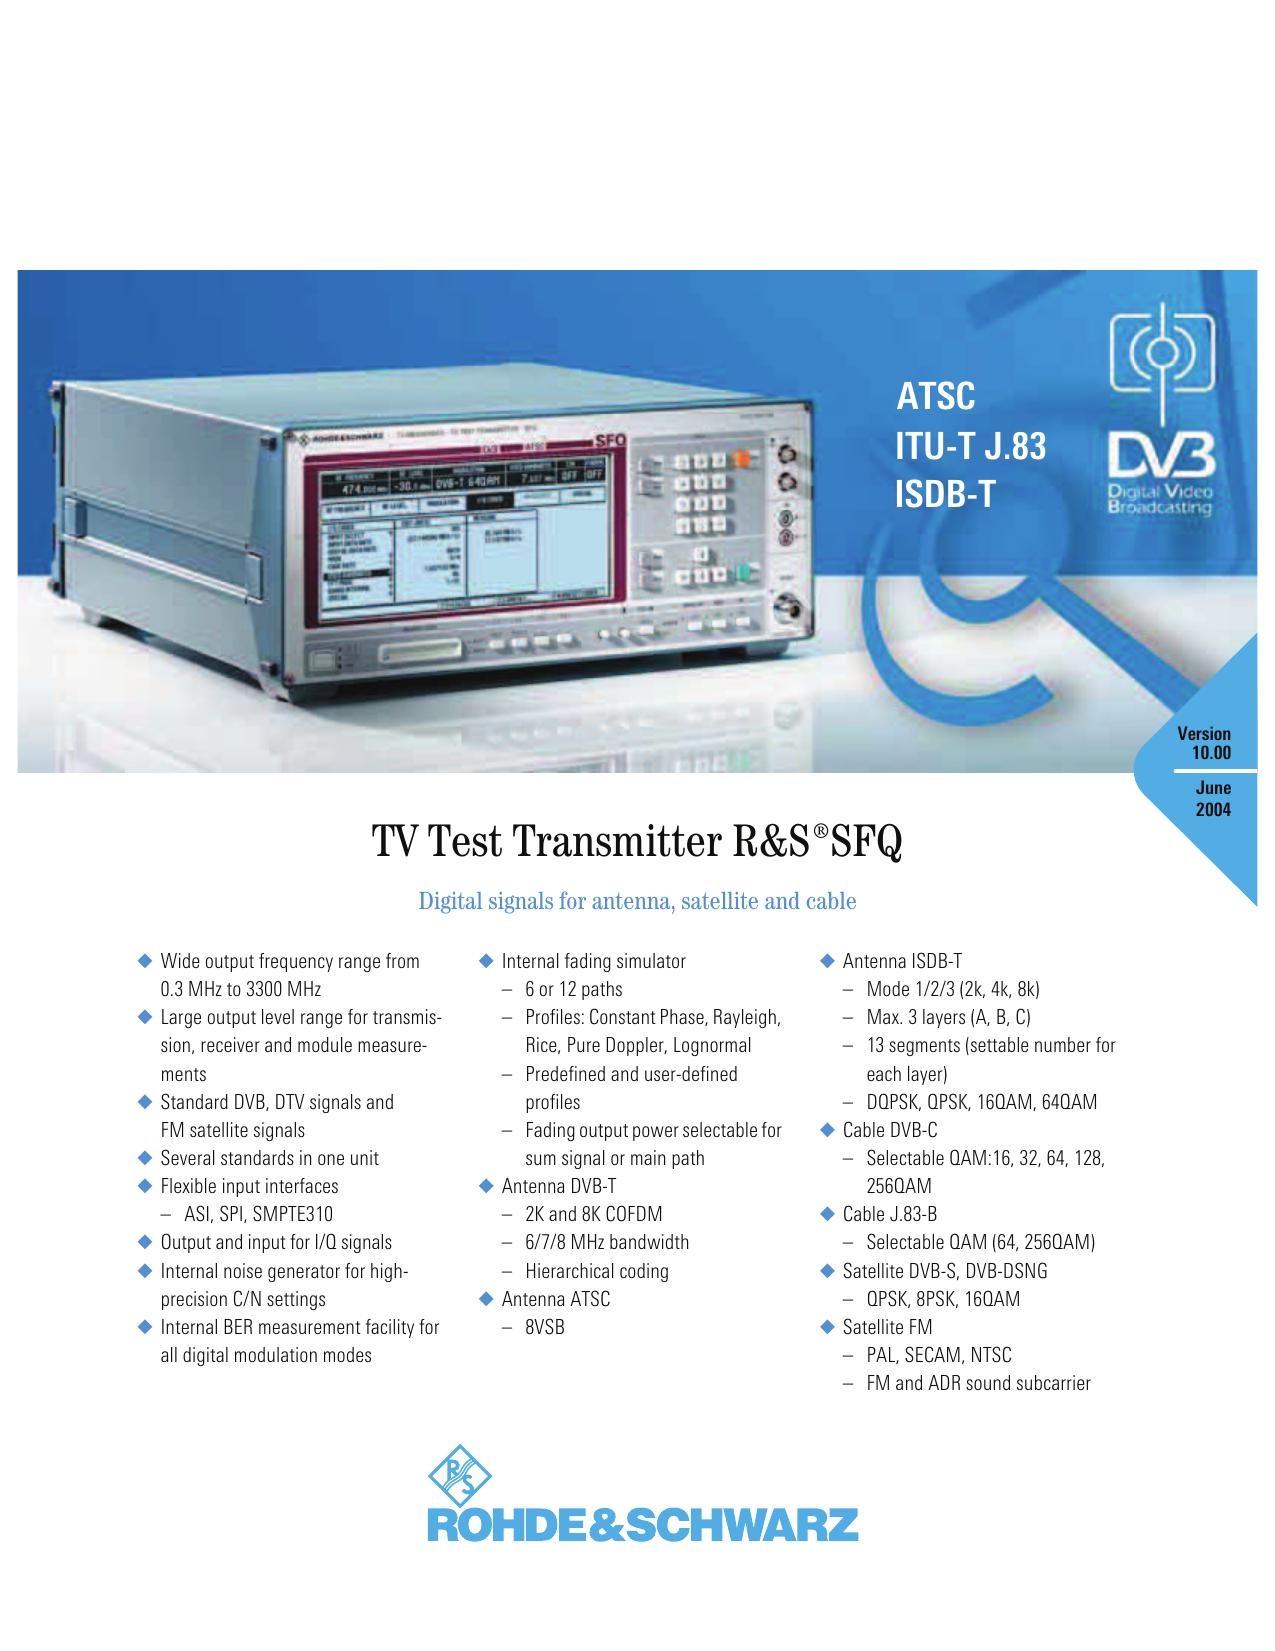 TV Test Transmitter ¸SFQ | manualzz com